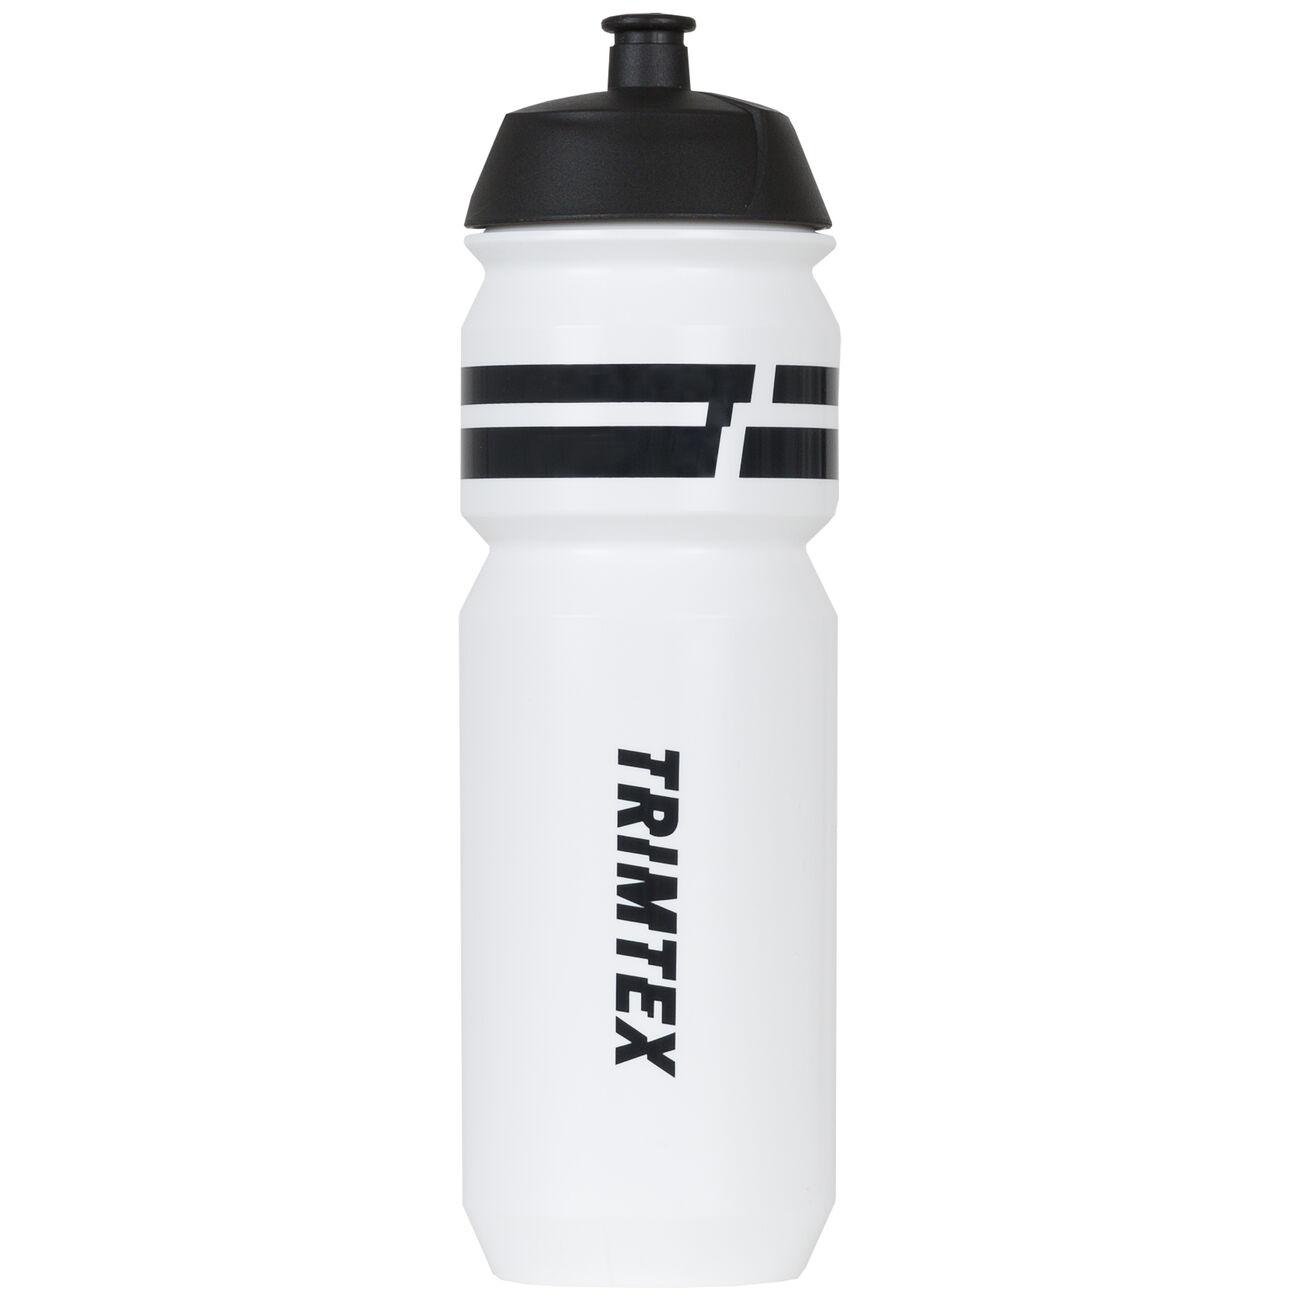 Trimtex Water Bottle 750 ml